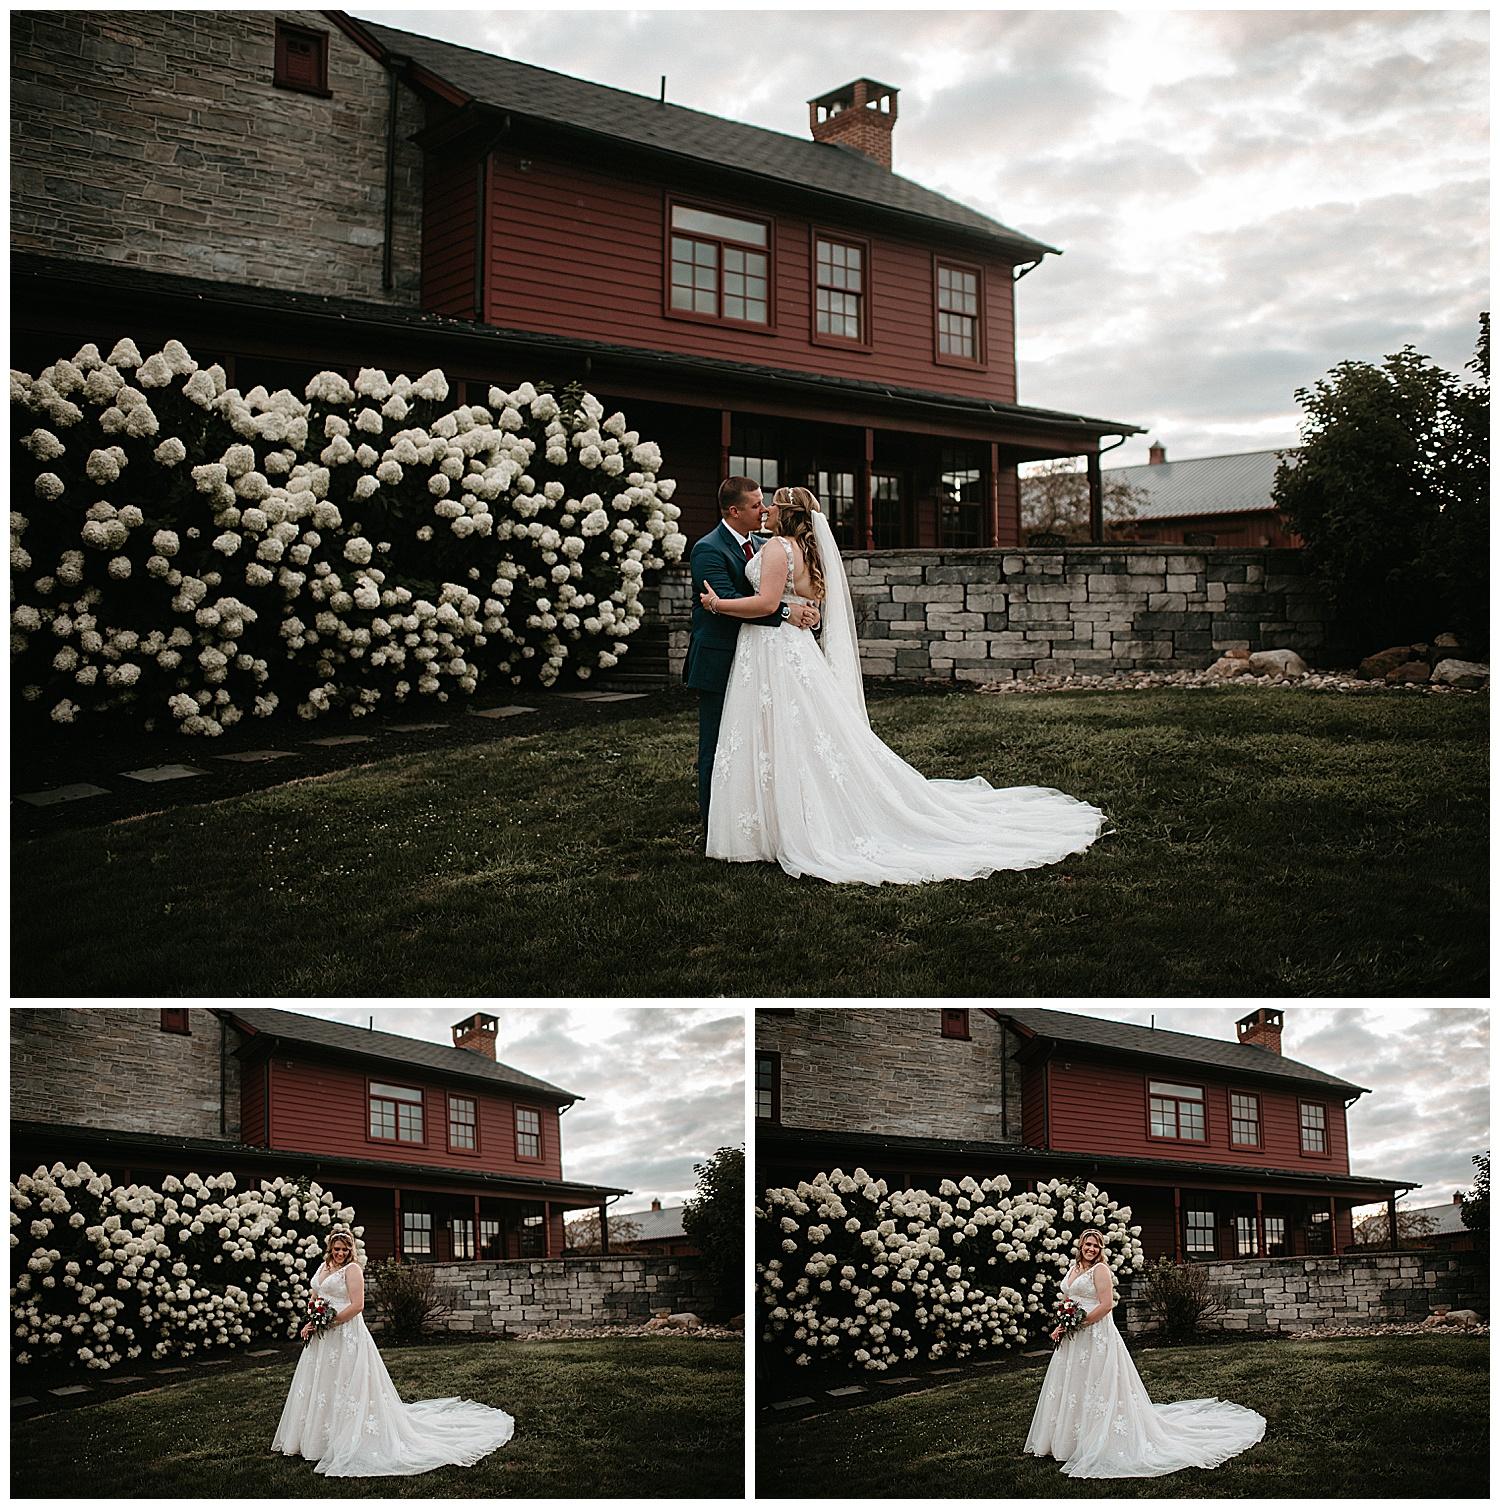 NEPA-Bloomgsburg-Wedding-Photographer-at-The-Barn-at-Greystone-Farms-Watsontown-PA_0097.jpg